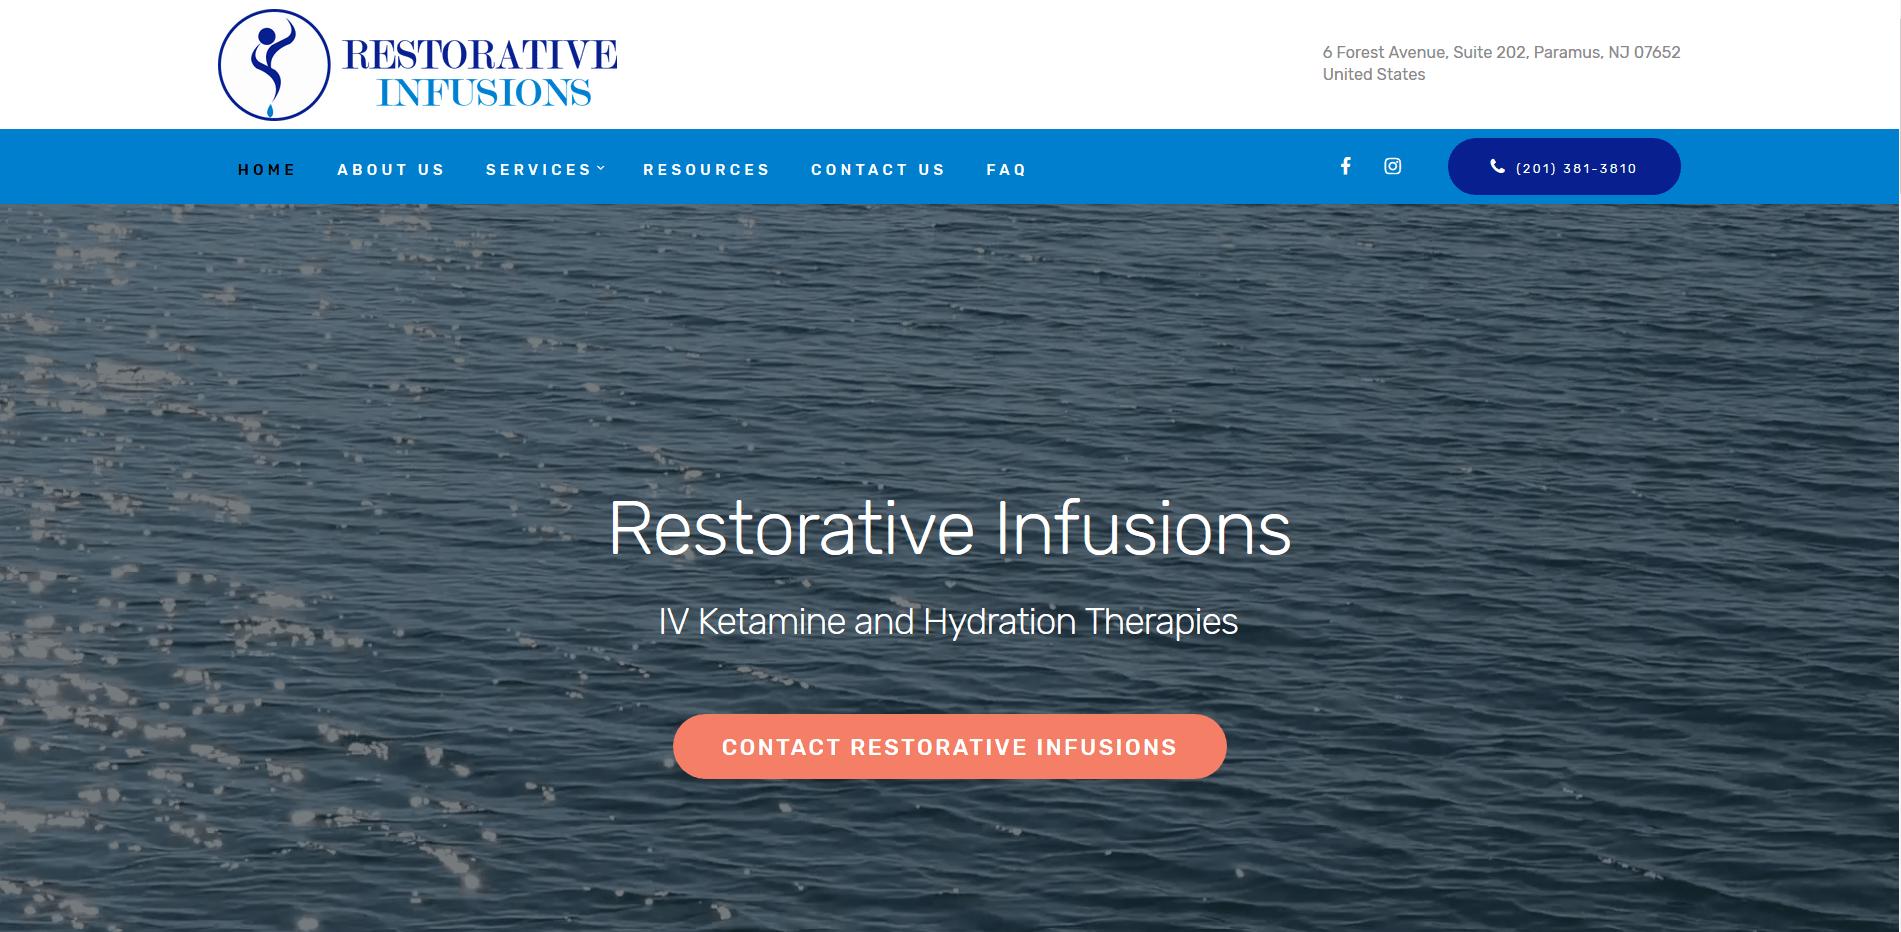 "<a href=""http://www.restorativeinfusions.com"">www.restorativeinfusions.com</a>"